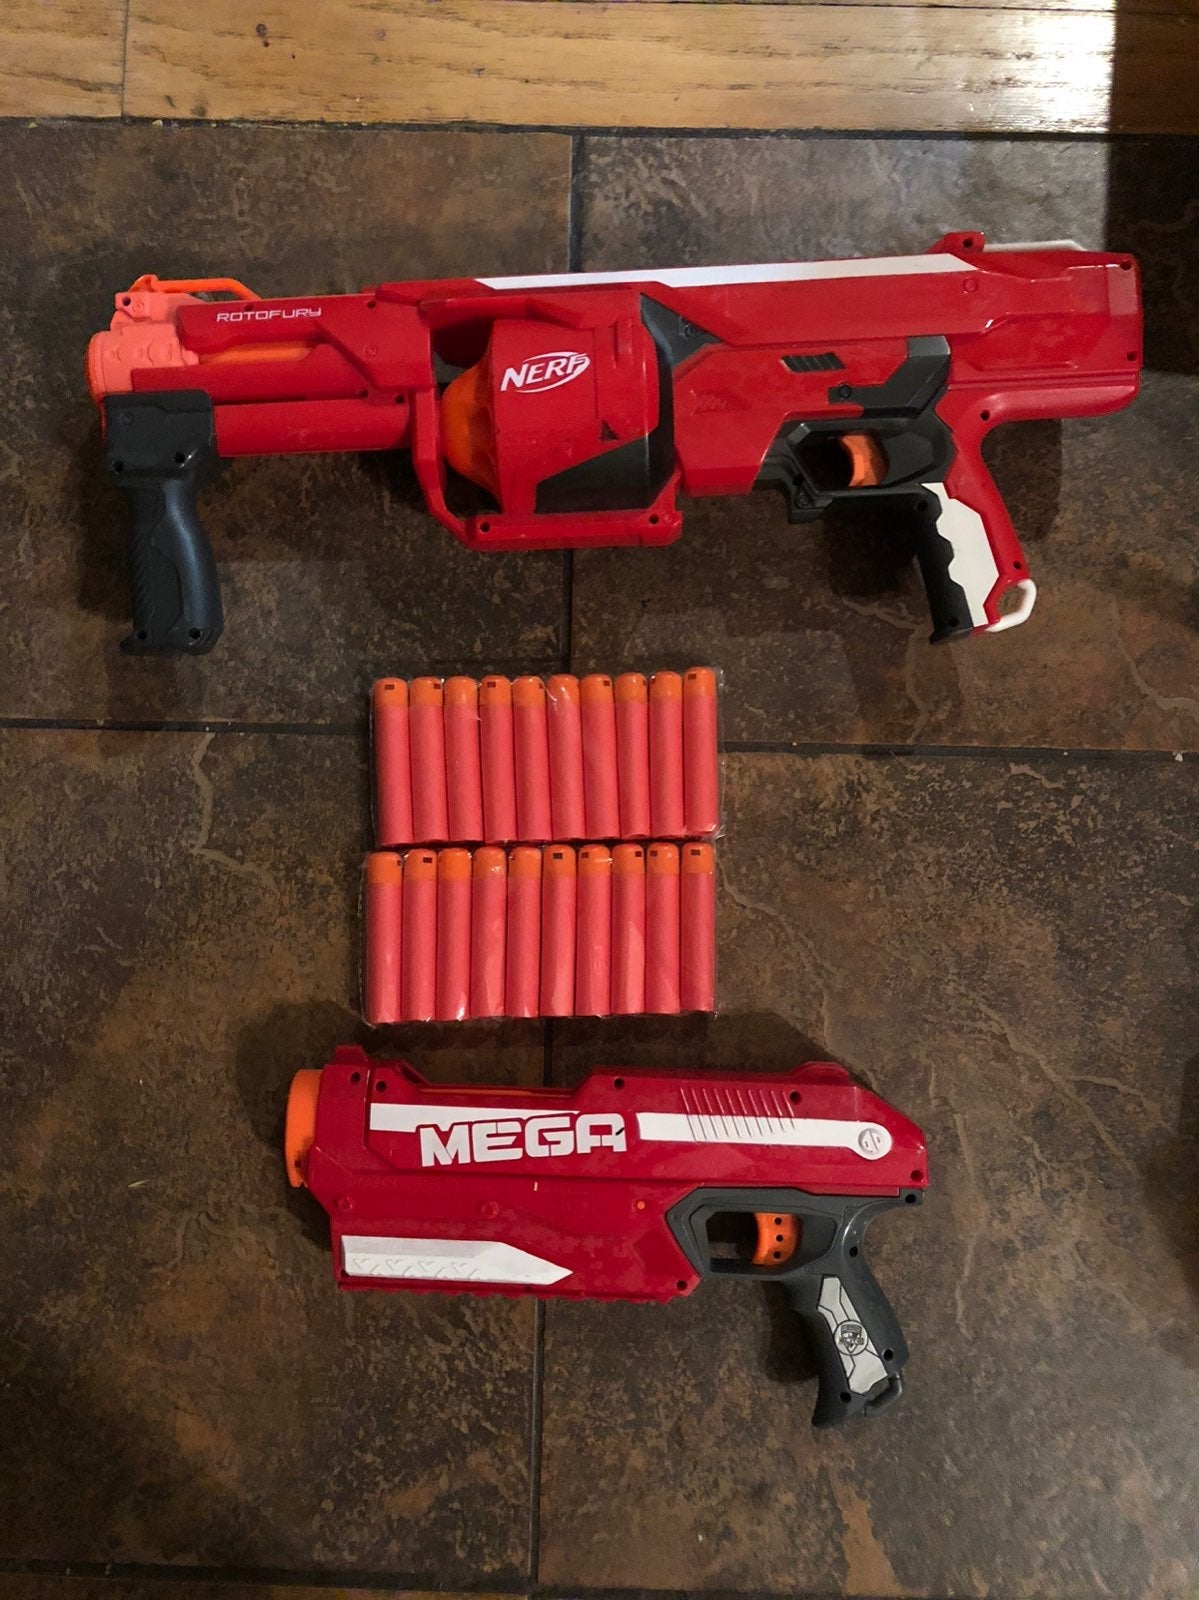 Nerf Mega Rotofire and Magnus $35